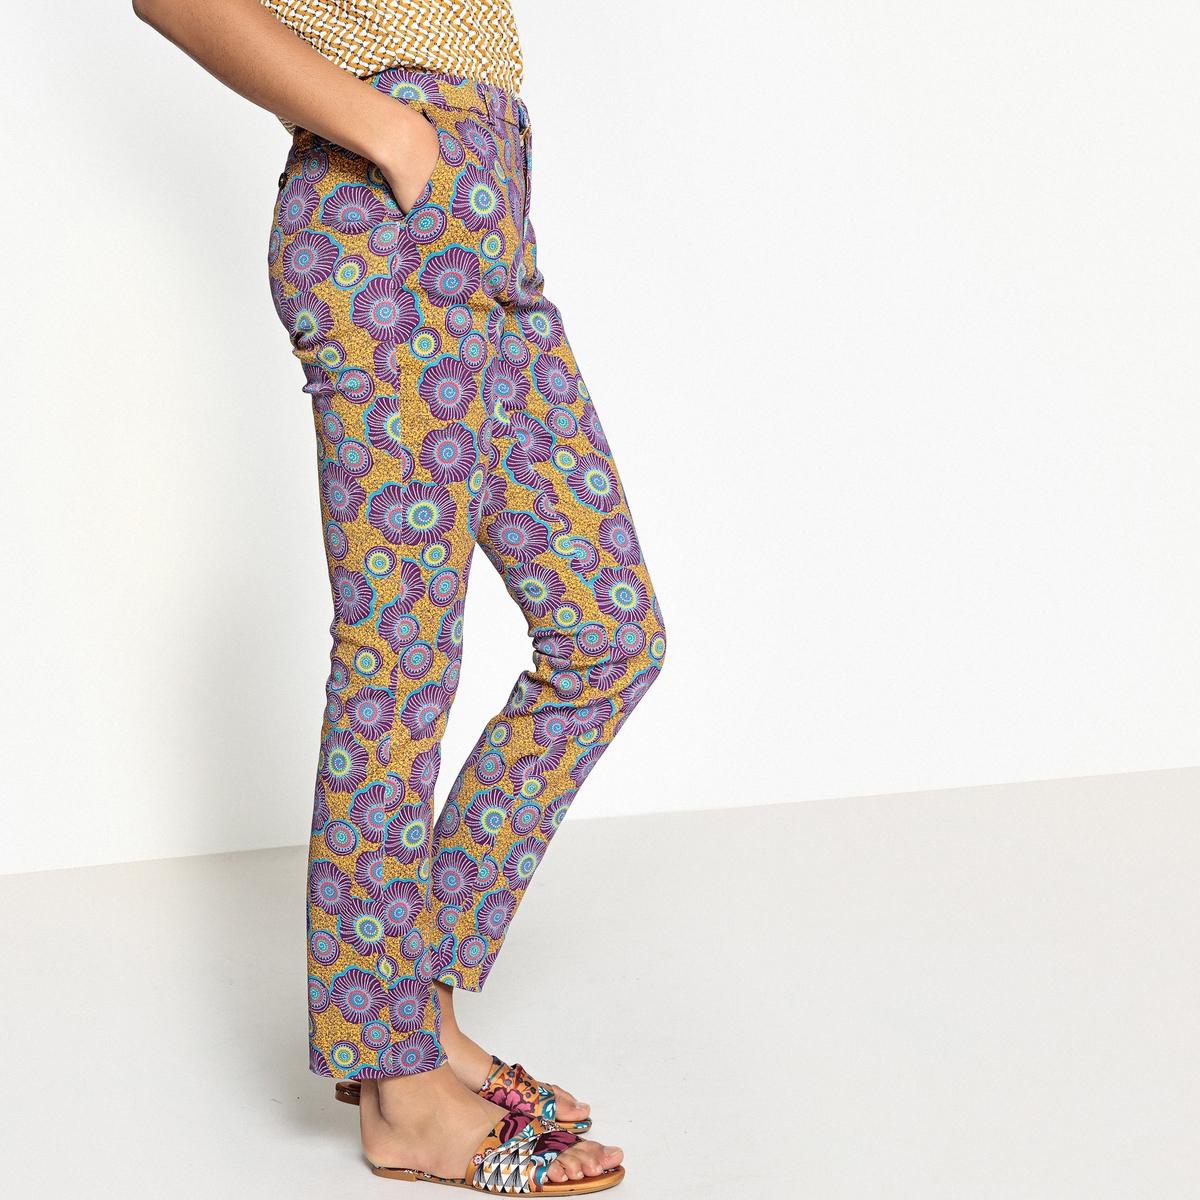 Брюки дудочки с рисунком брюки дудочки quelle laura scott 331207